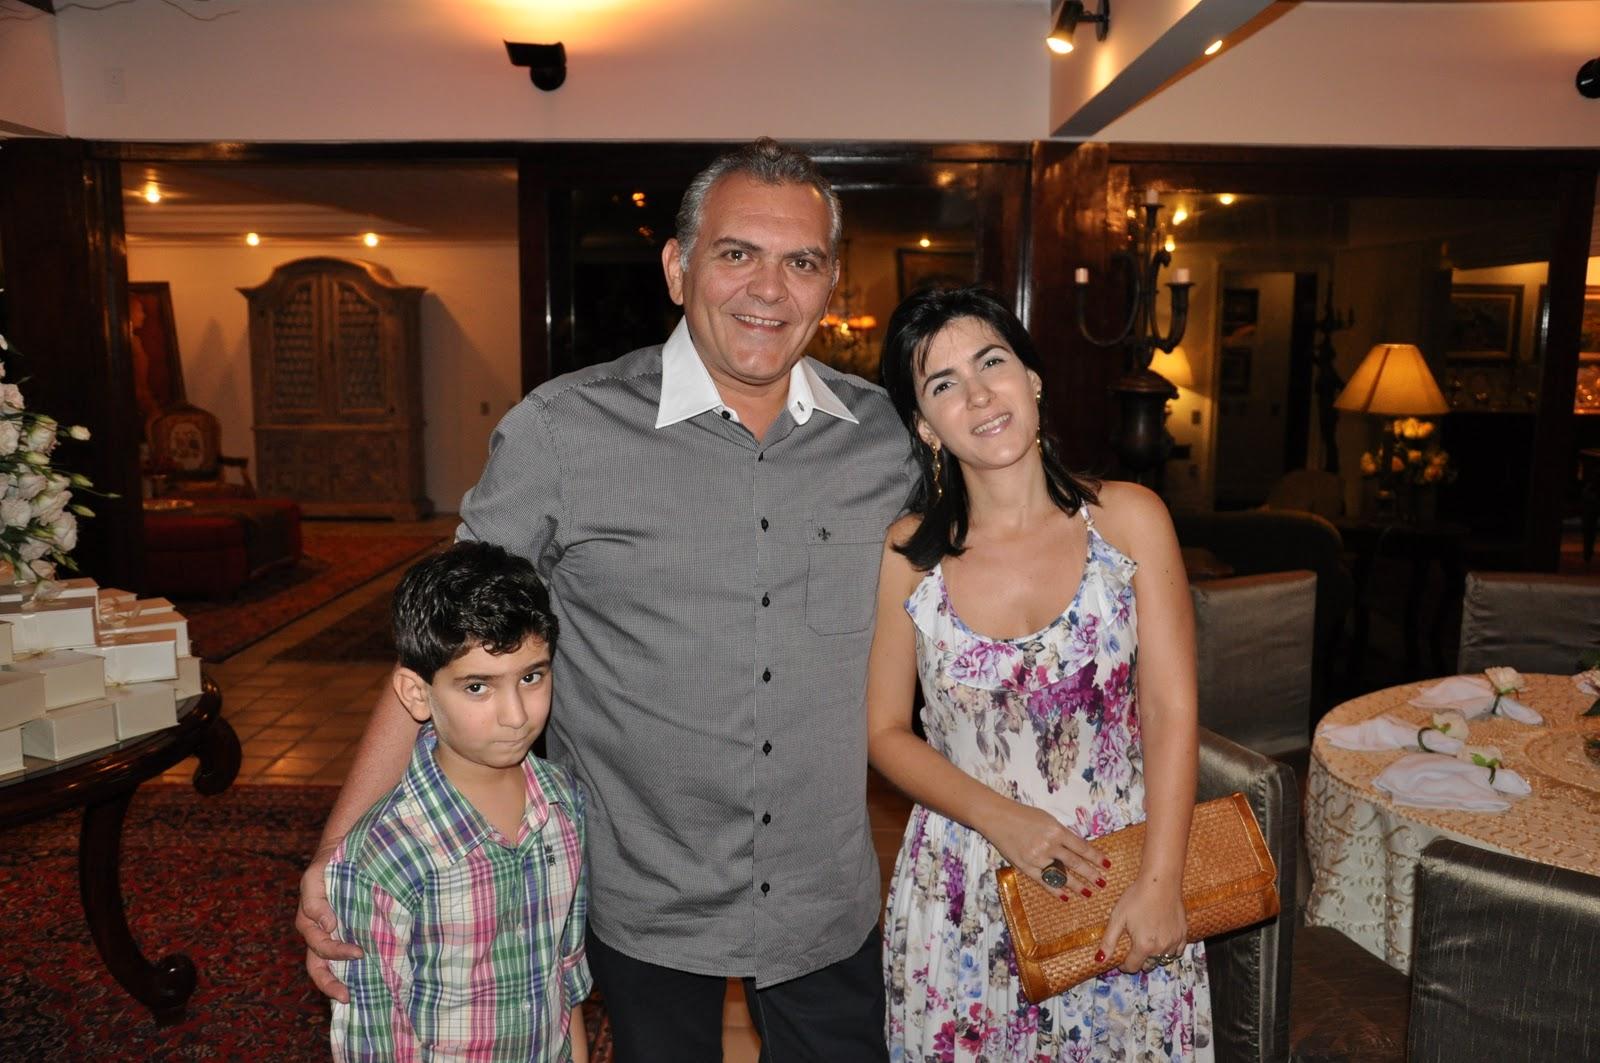 http://1.bp.blogspot.com/-yWiPrGEXuts/Tt0-MhDnKbI/AAAAAAAAEdw/vBjBmz4vC5o/s1600/04+-+Virg%25C3%25ADlio+Filho%252C+Virg%25C3%25ADlio+e+Samia+Pinheiro.JPG